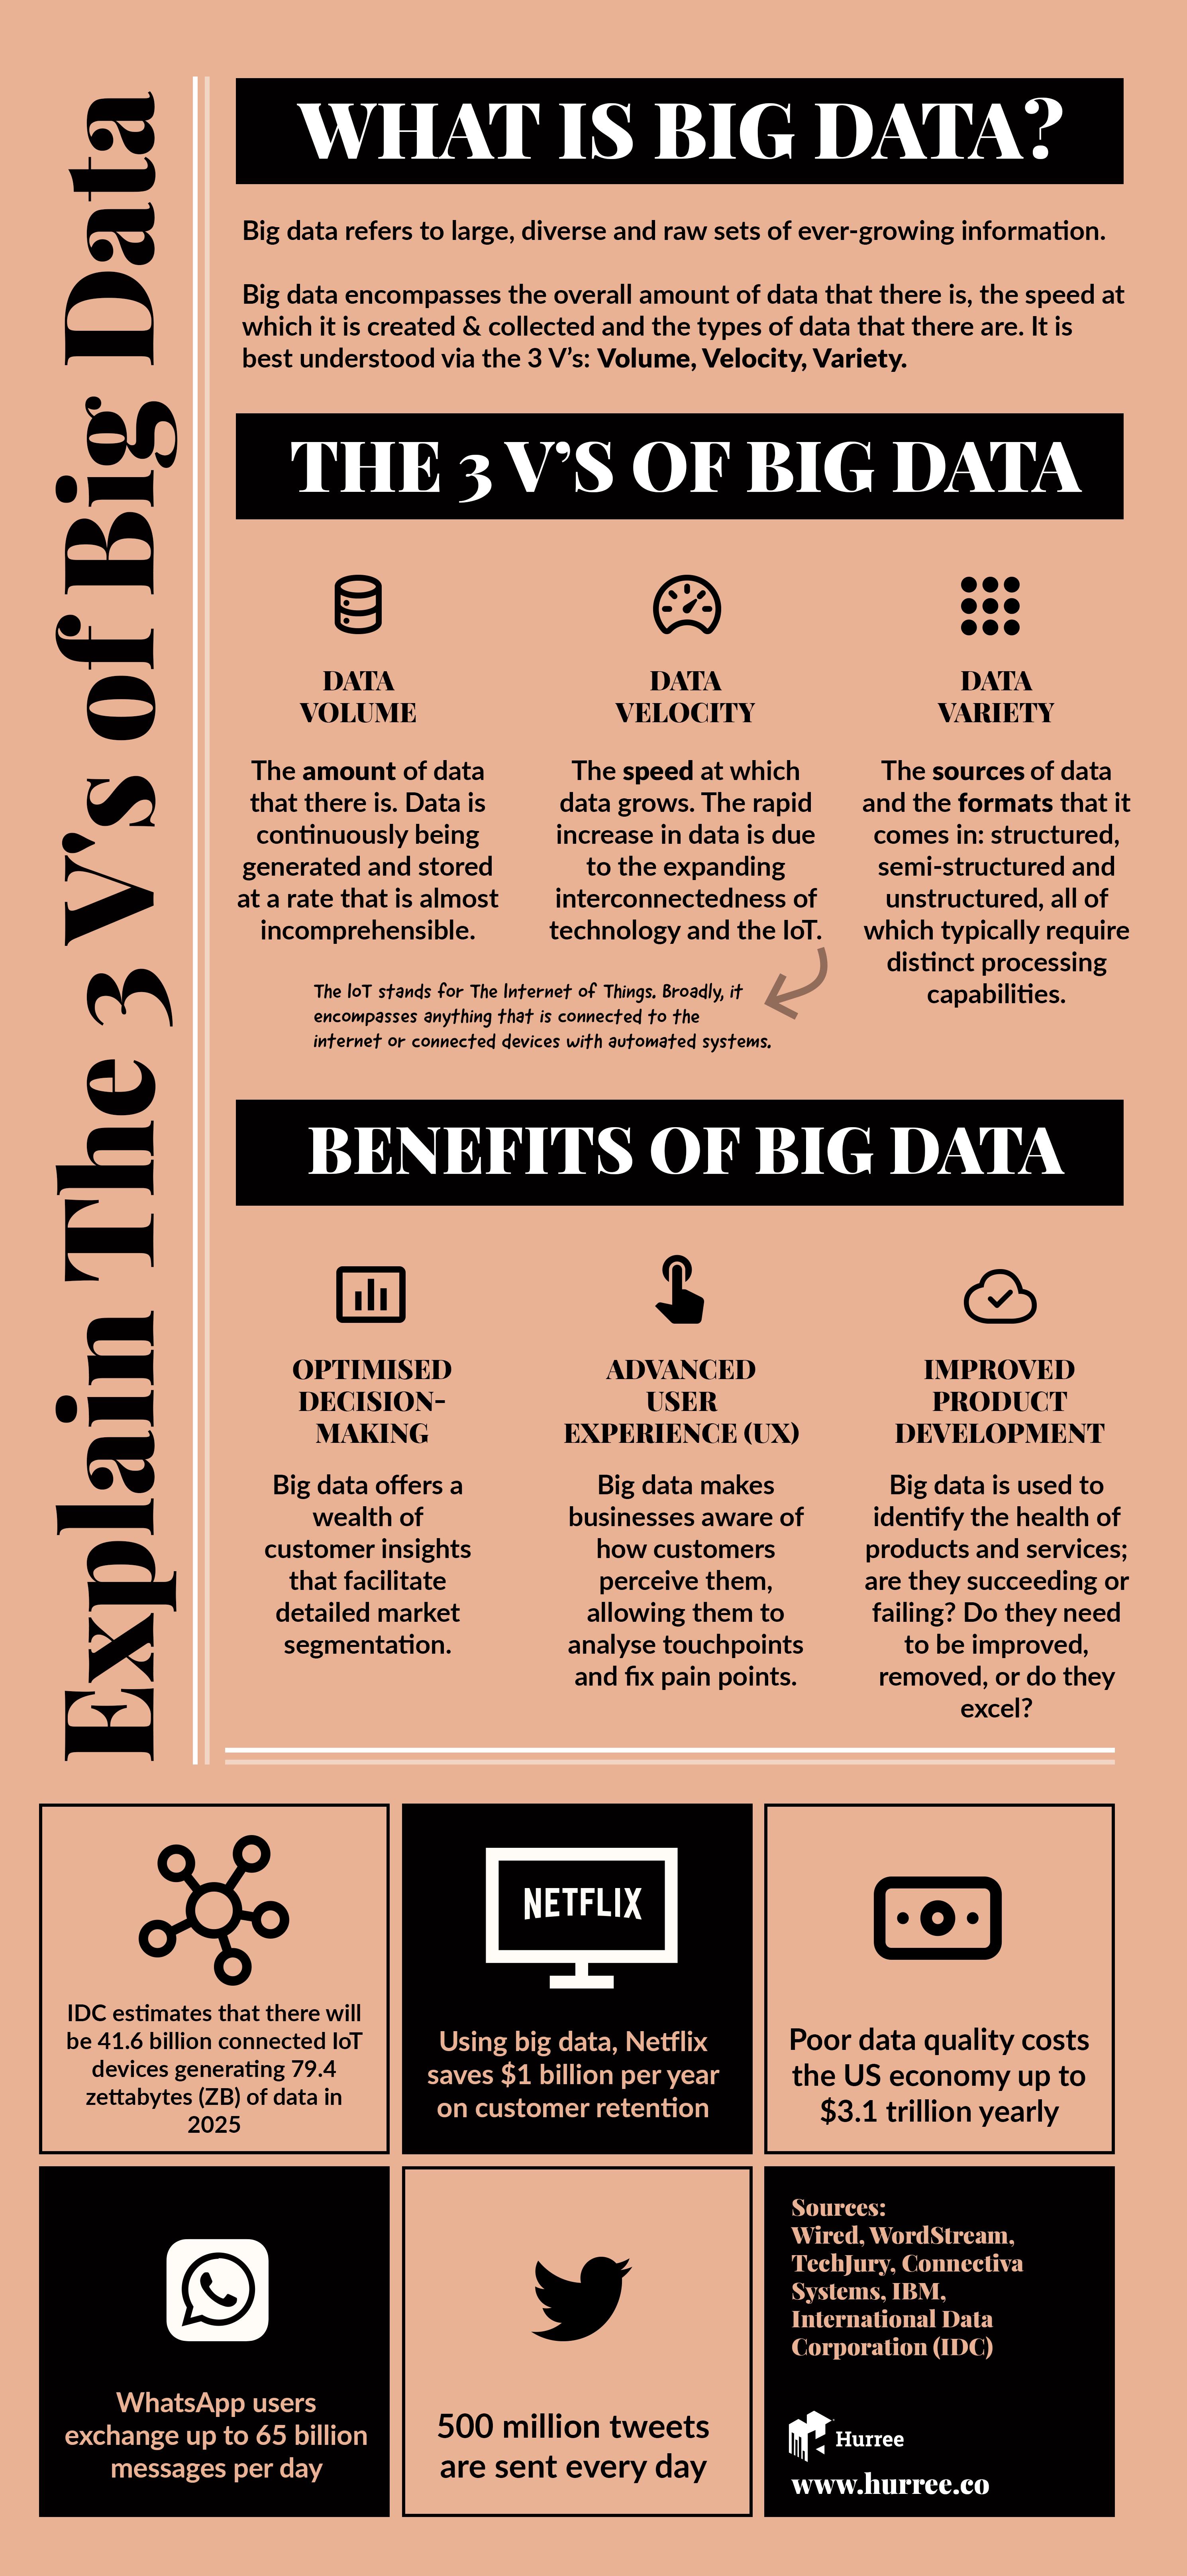 Infographic what are the 3 V's of big data? Explain the 3 V's of big data: data Volume, Data Velocity, Data Variety. Benefits of big data. Hurree - The Segmentation Platform